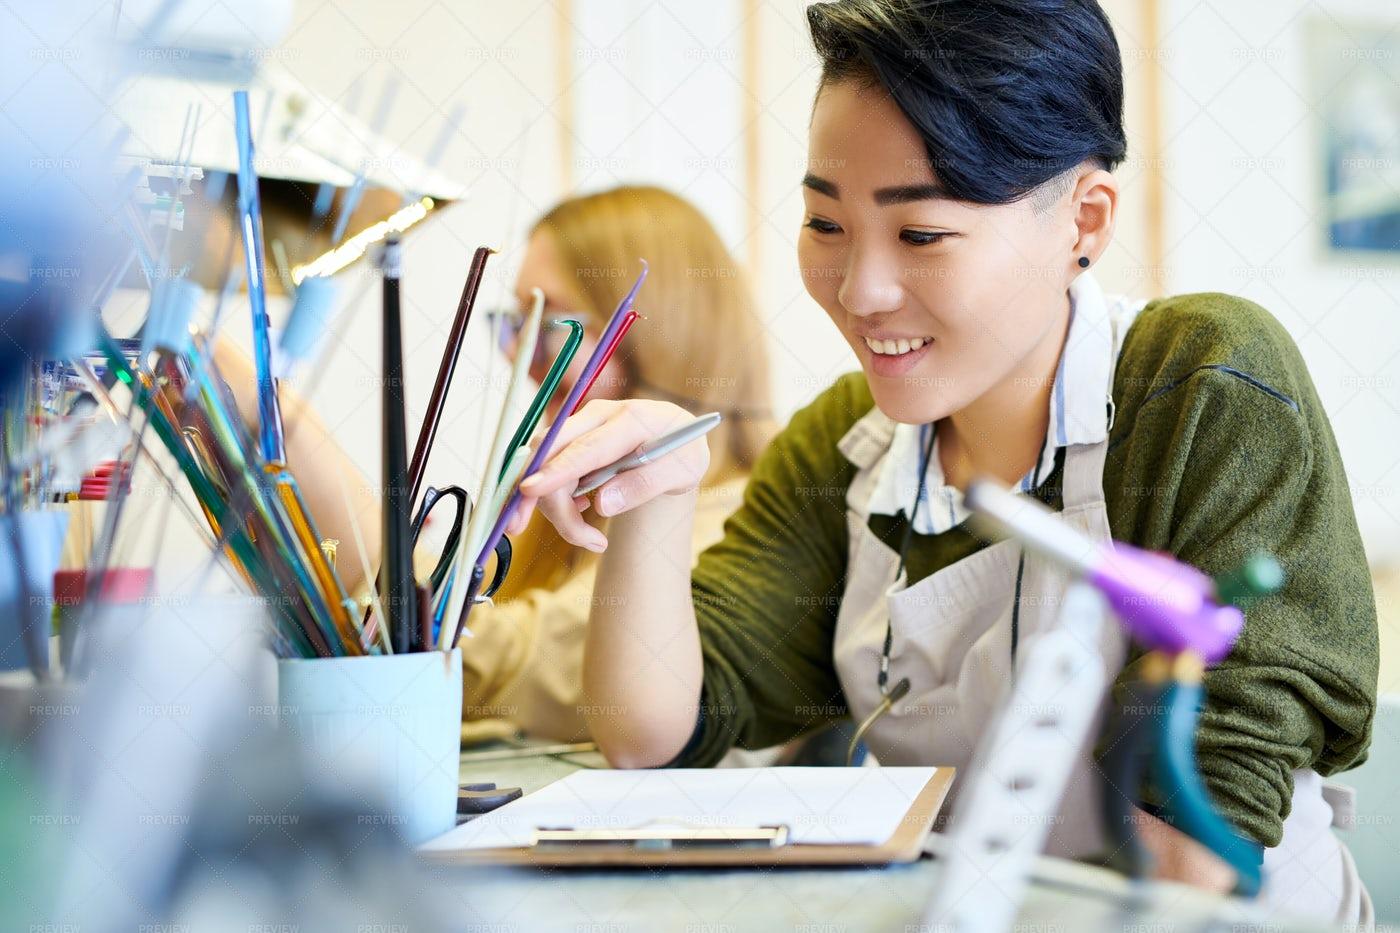 Cheerful Creative Woman In Workshop: Stock Photos